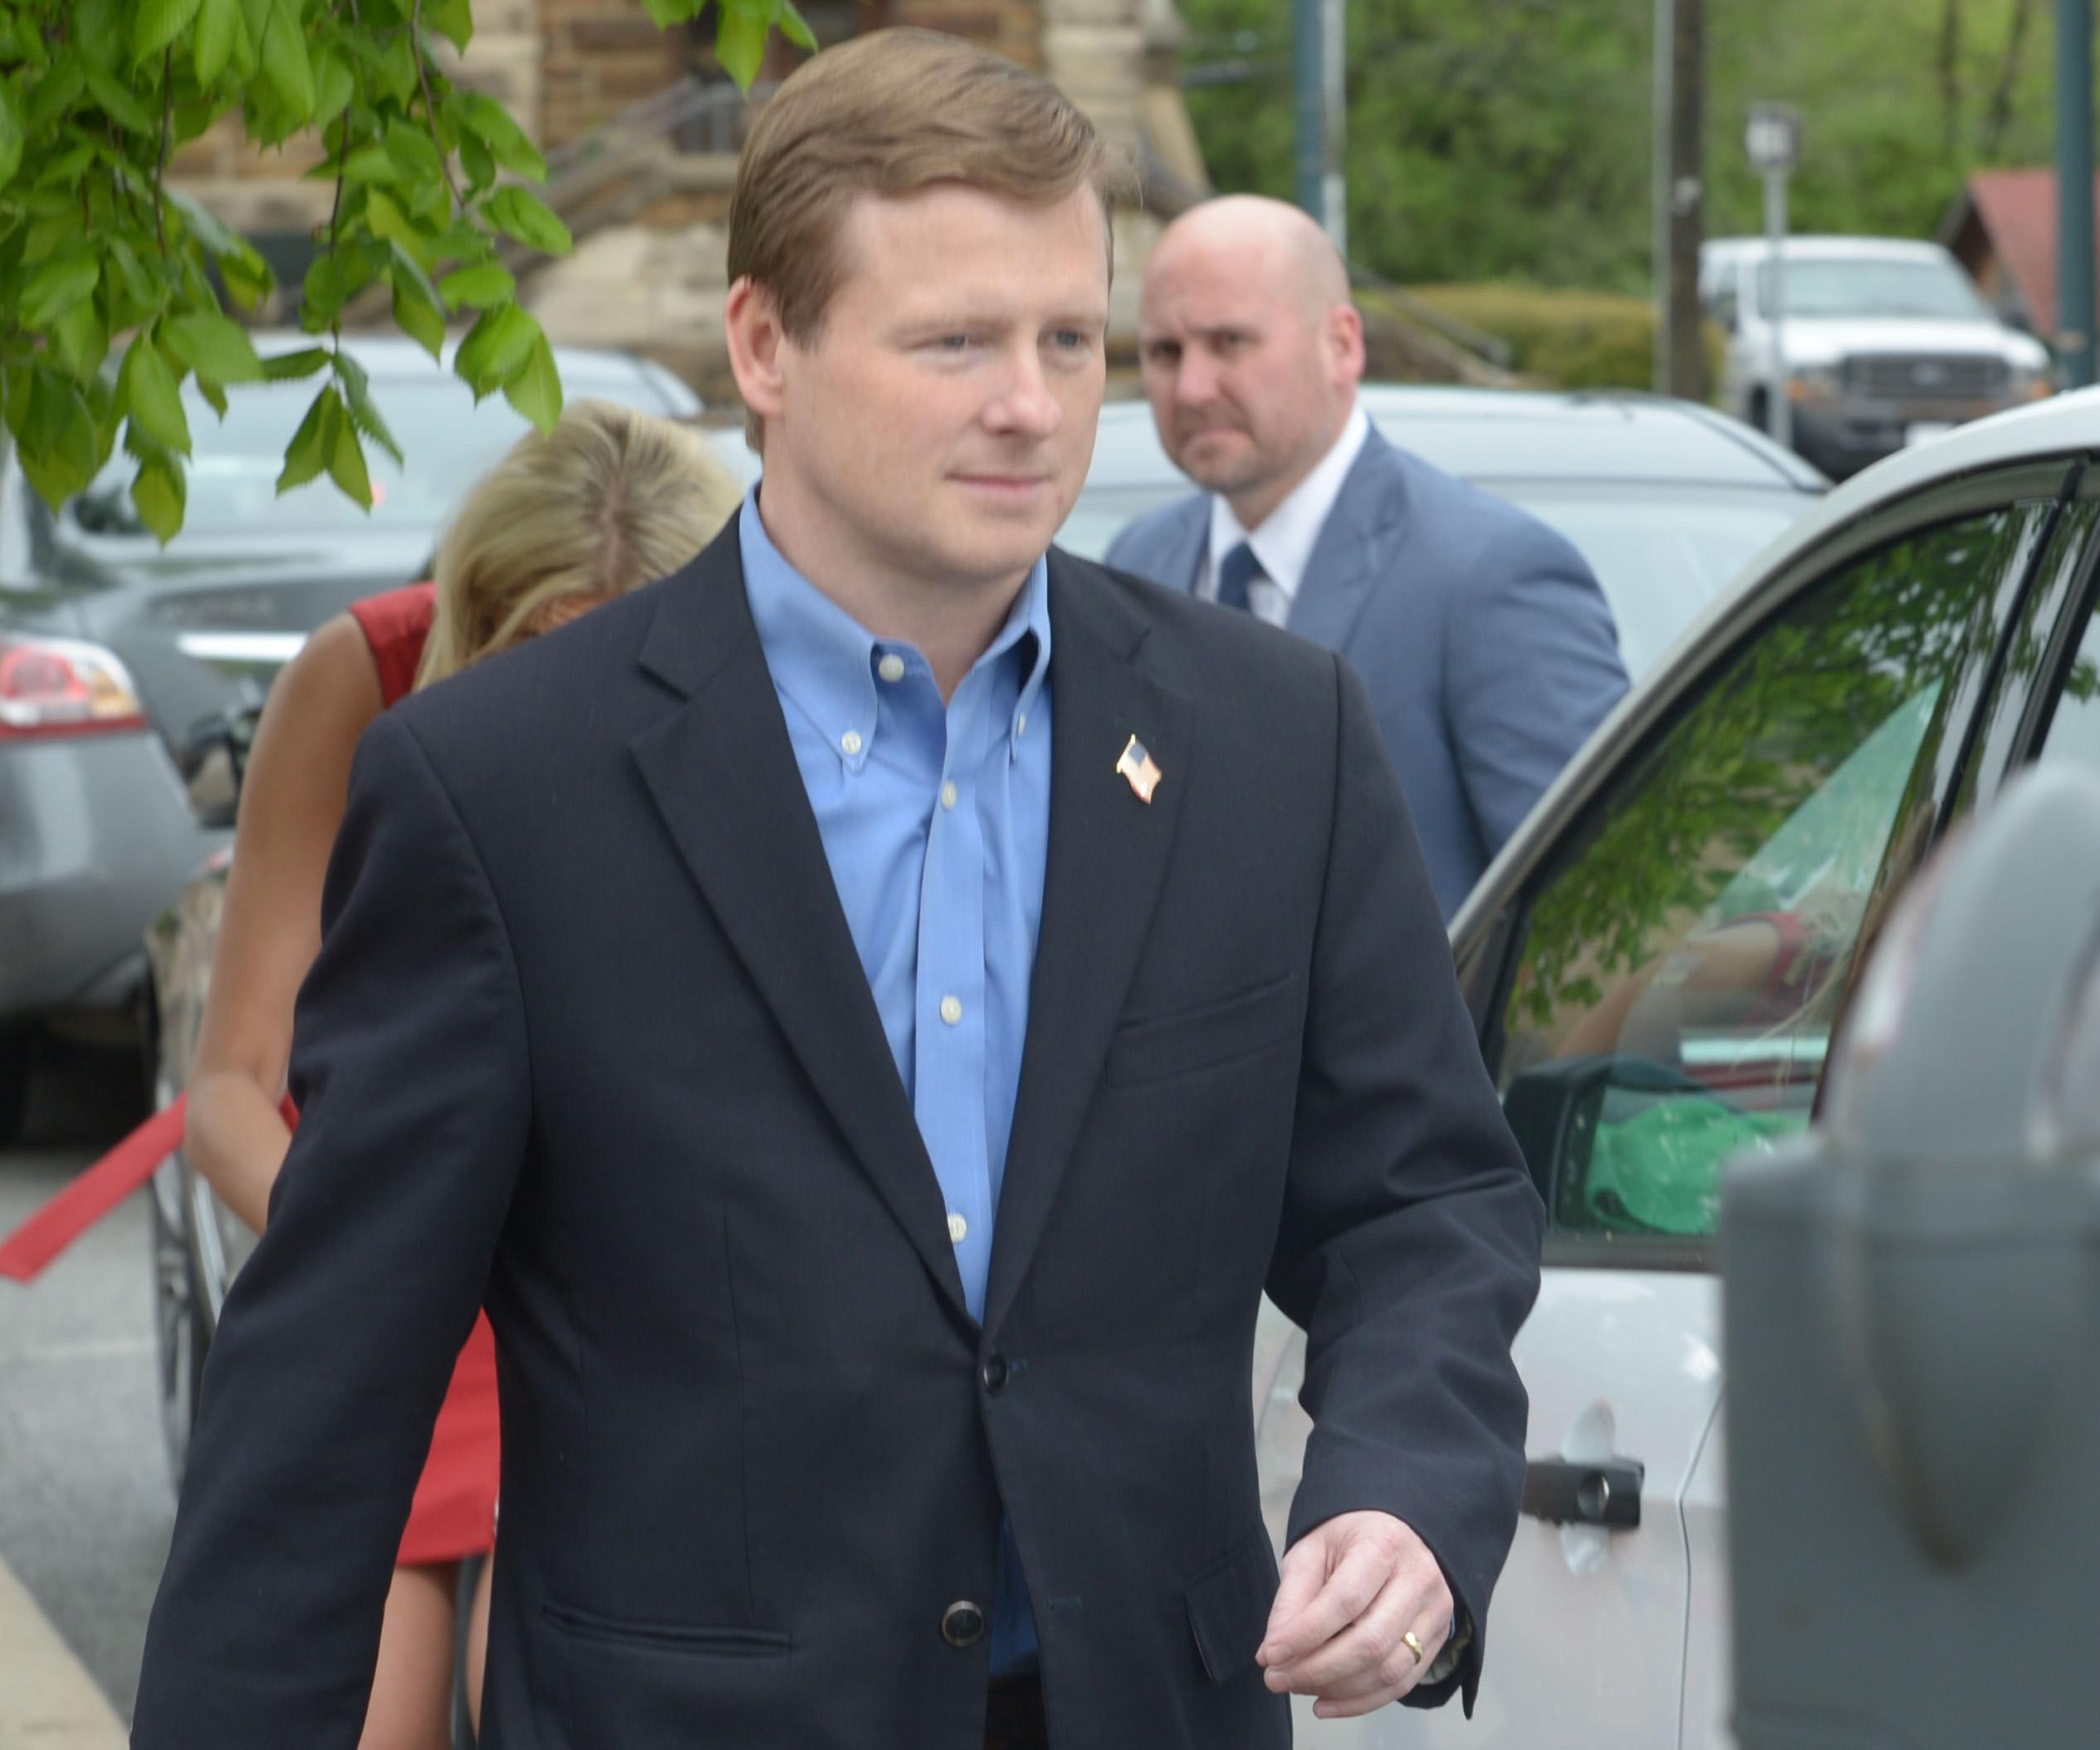 Shelton reports to prison to serve corruption sentence